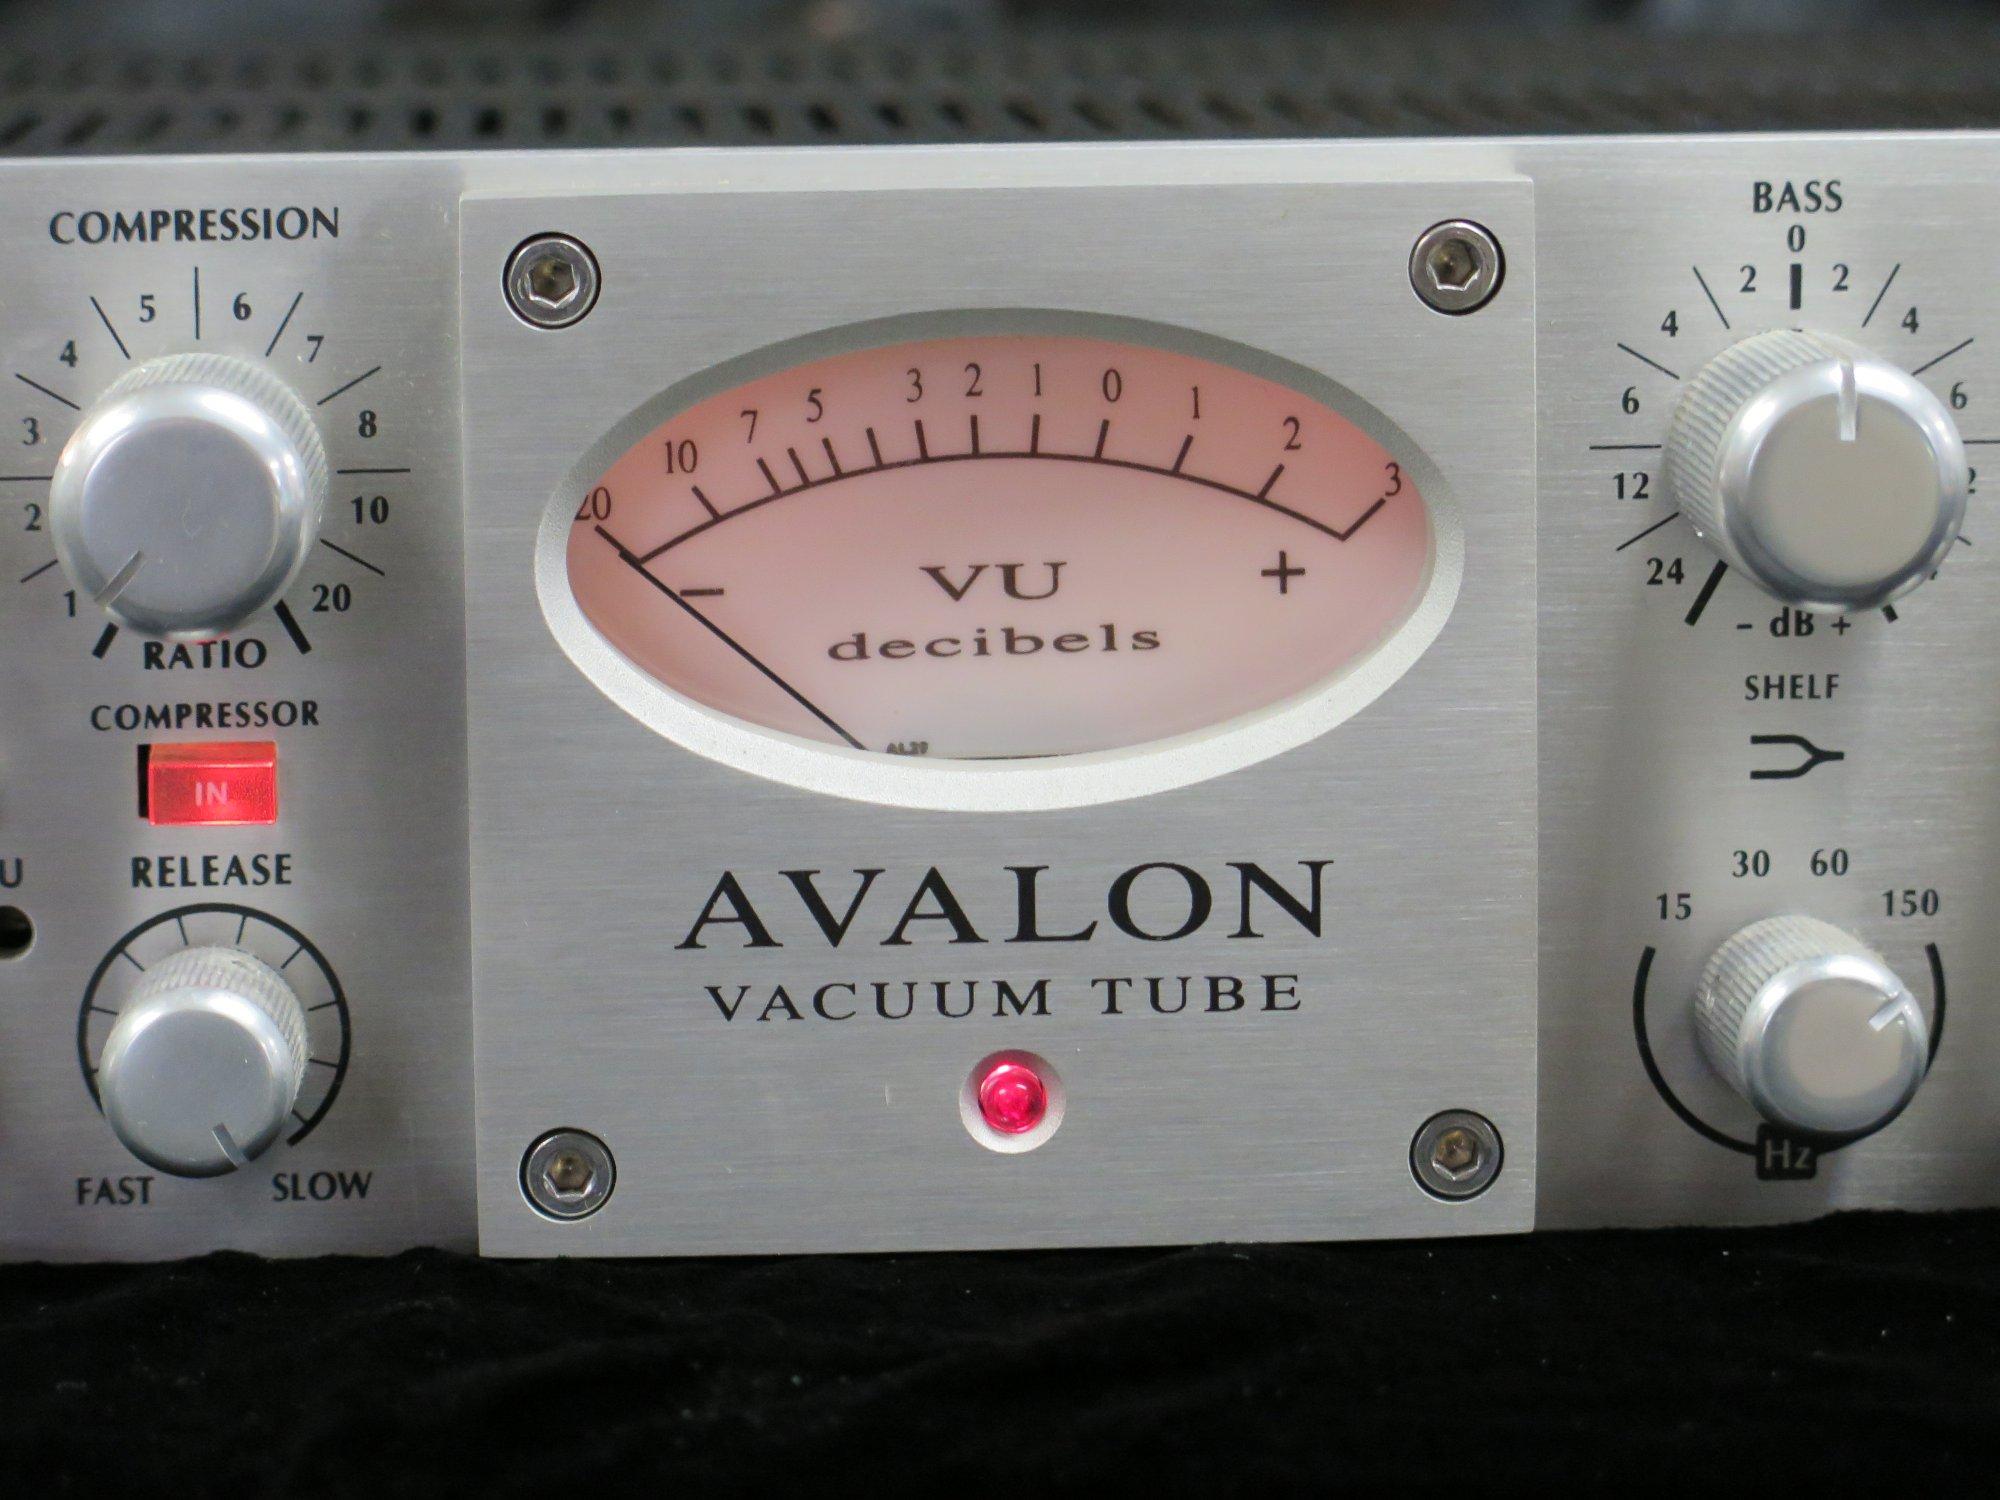 Avalon Vt 737sp (Used)